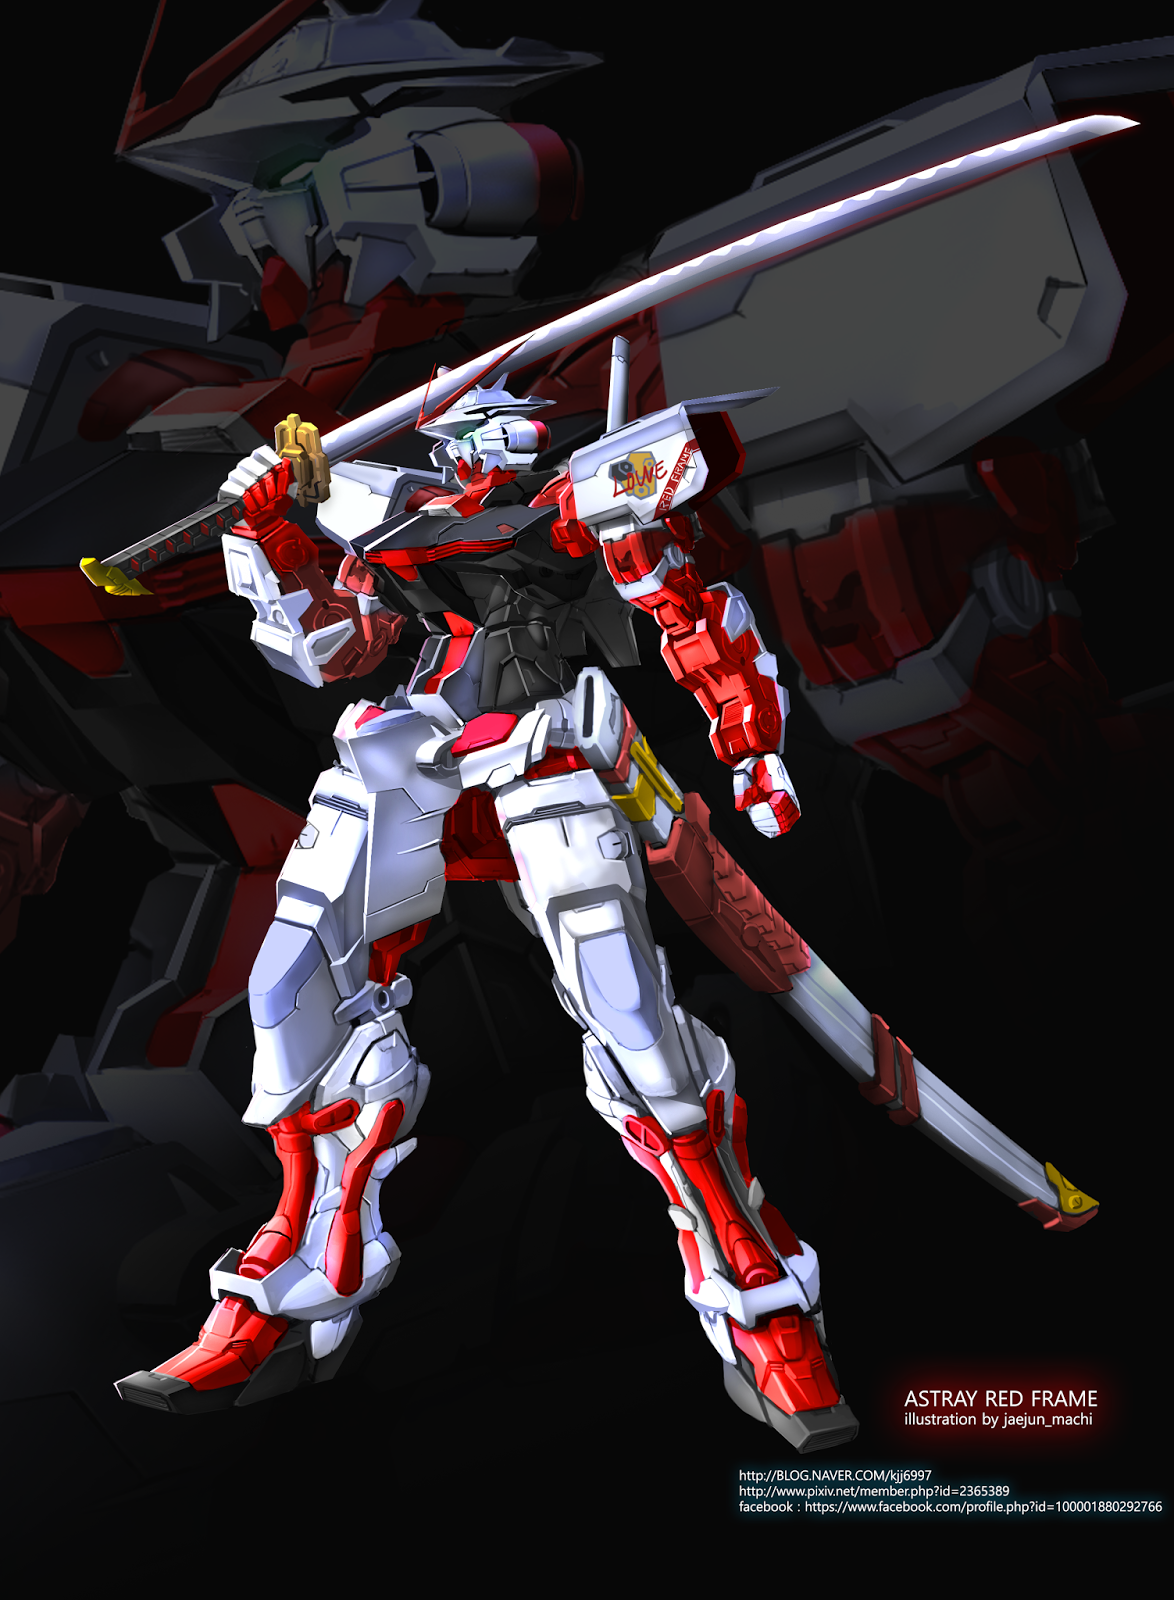 Awesome Gundam Digital Artworks [Updated 2/12/17] Gundam